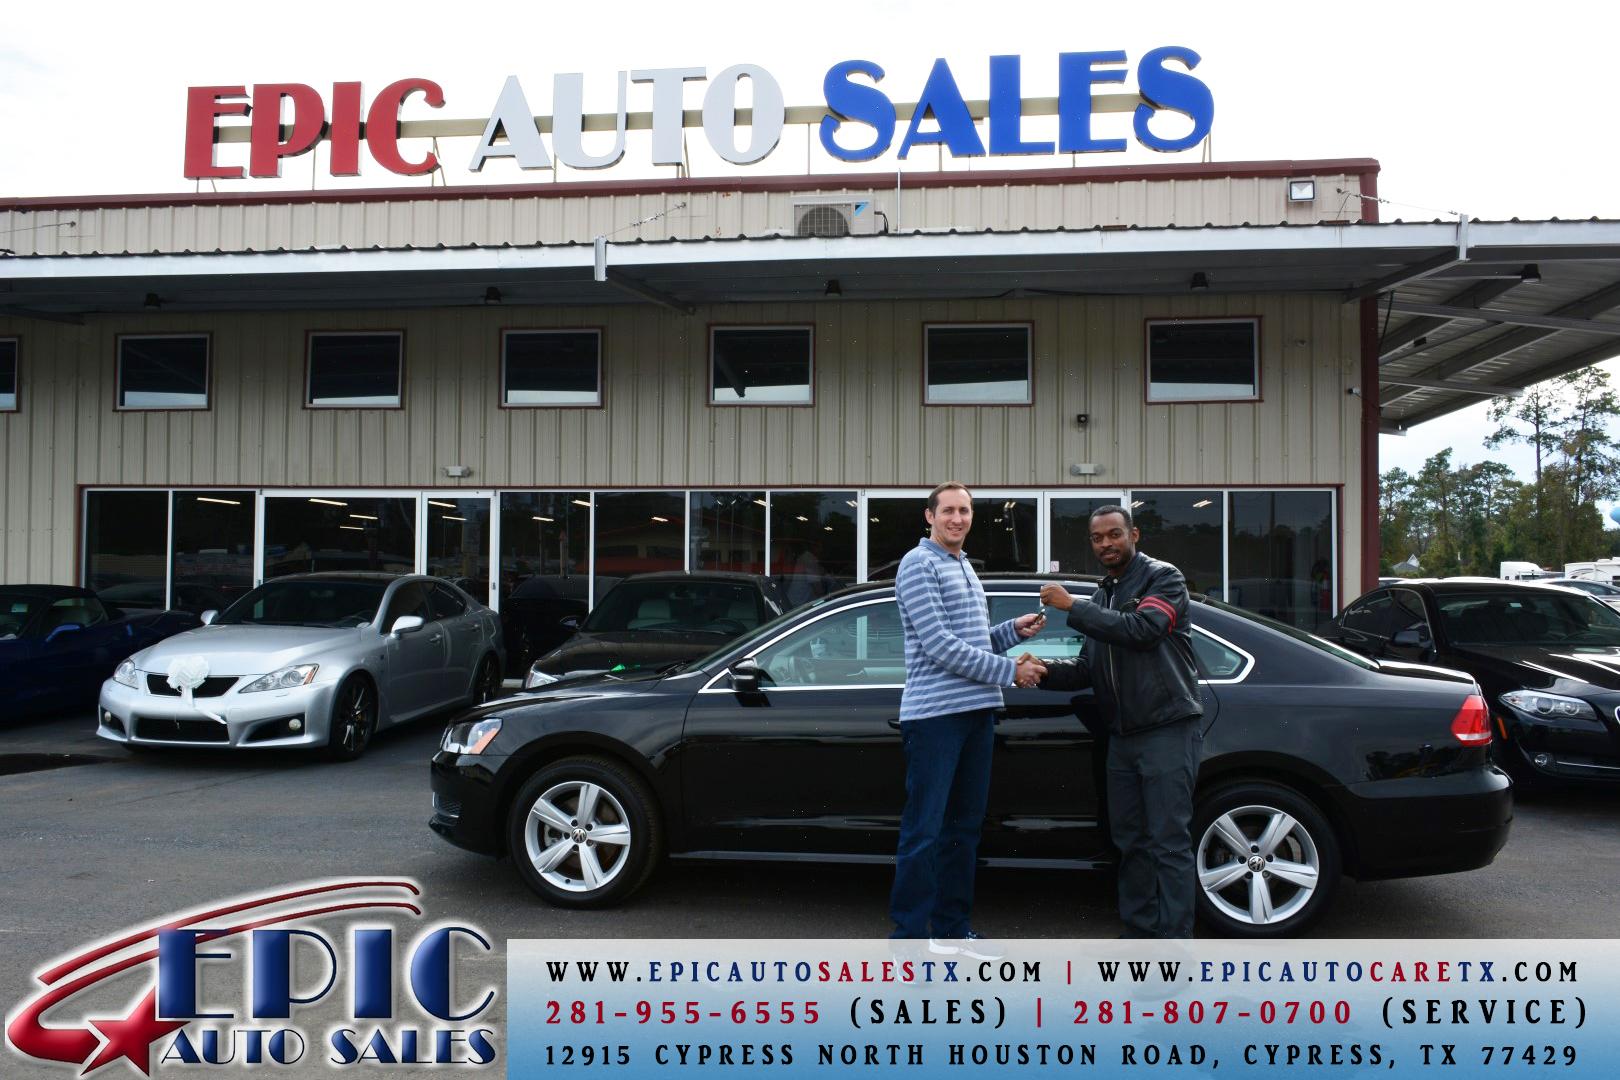 Epic Auto Sales image 2